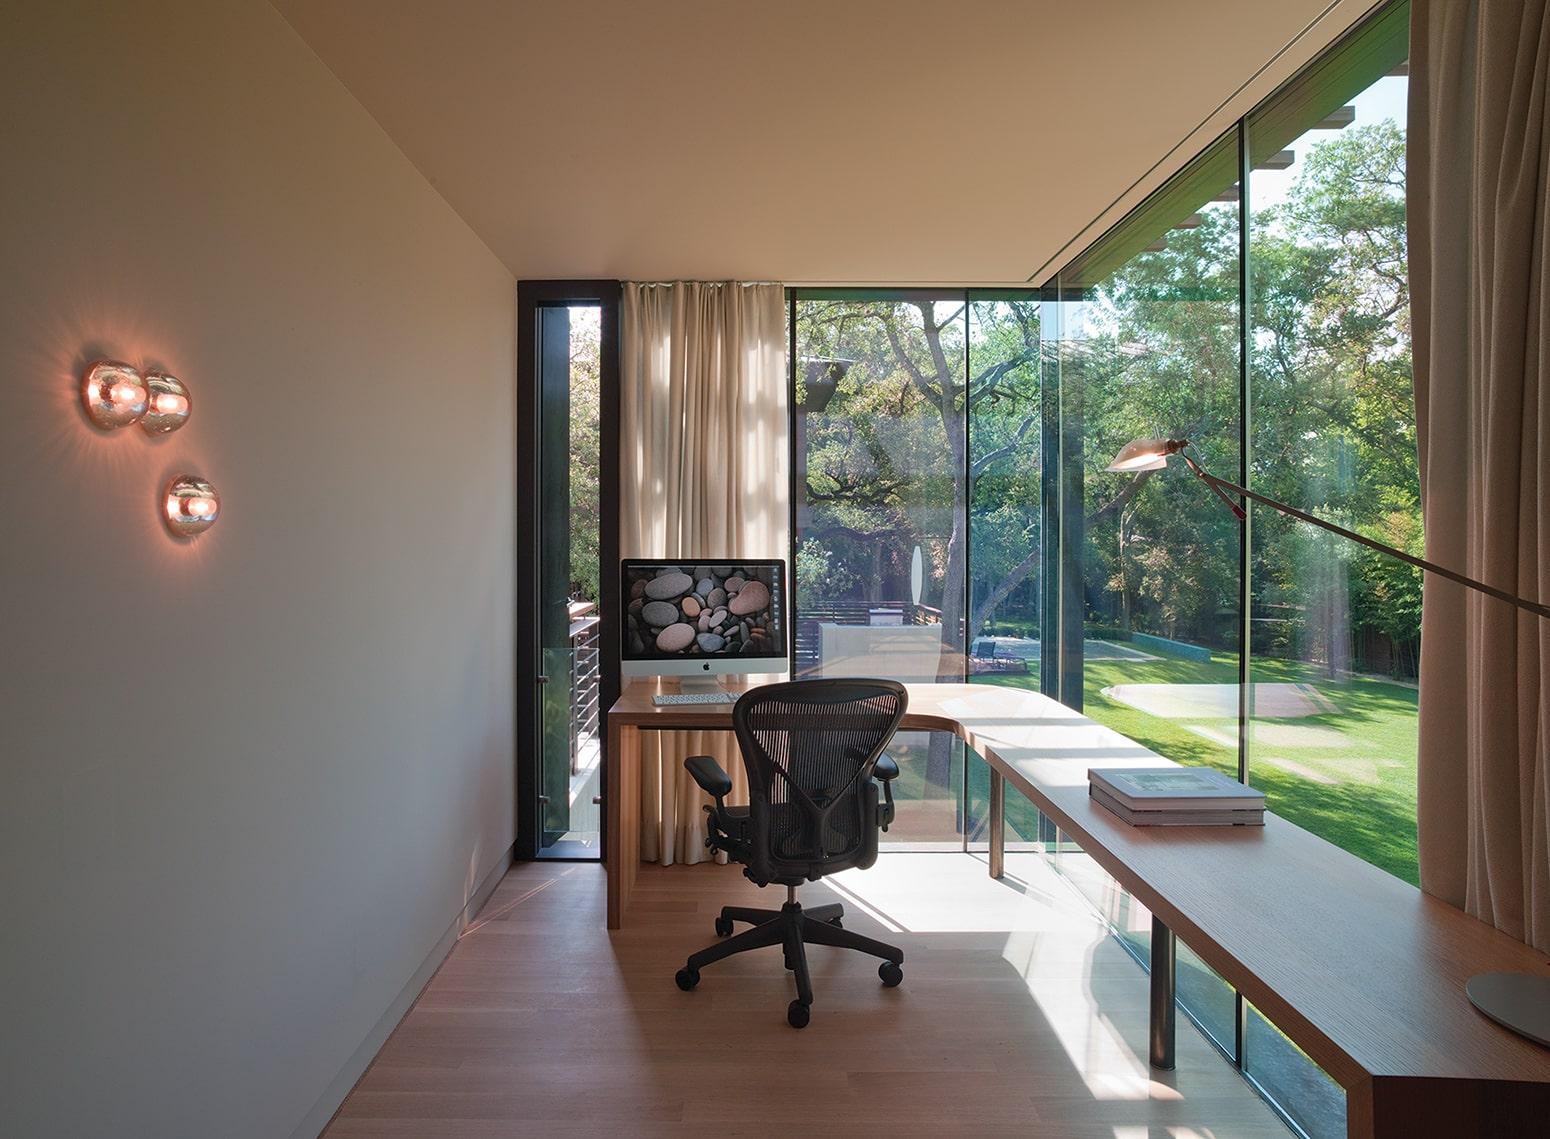 Contact - Webber + Studio in Austin, Texas